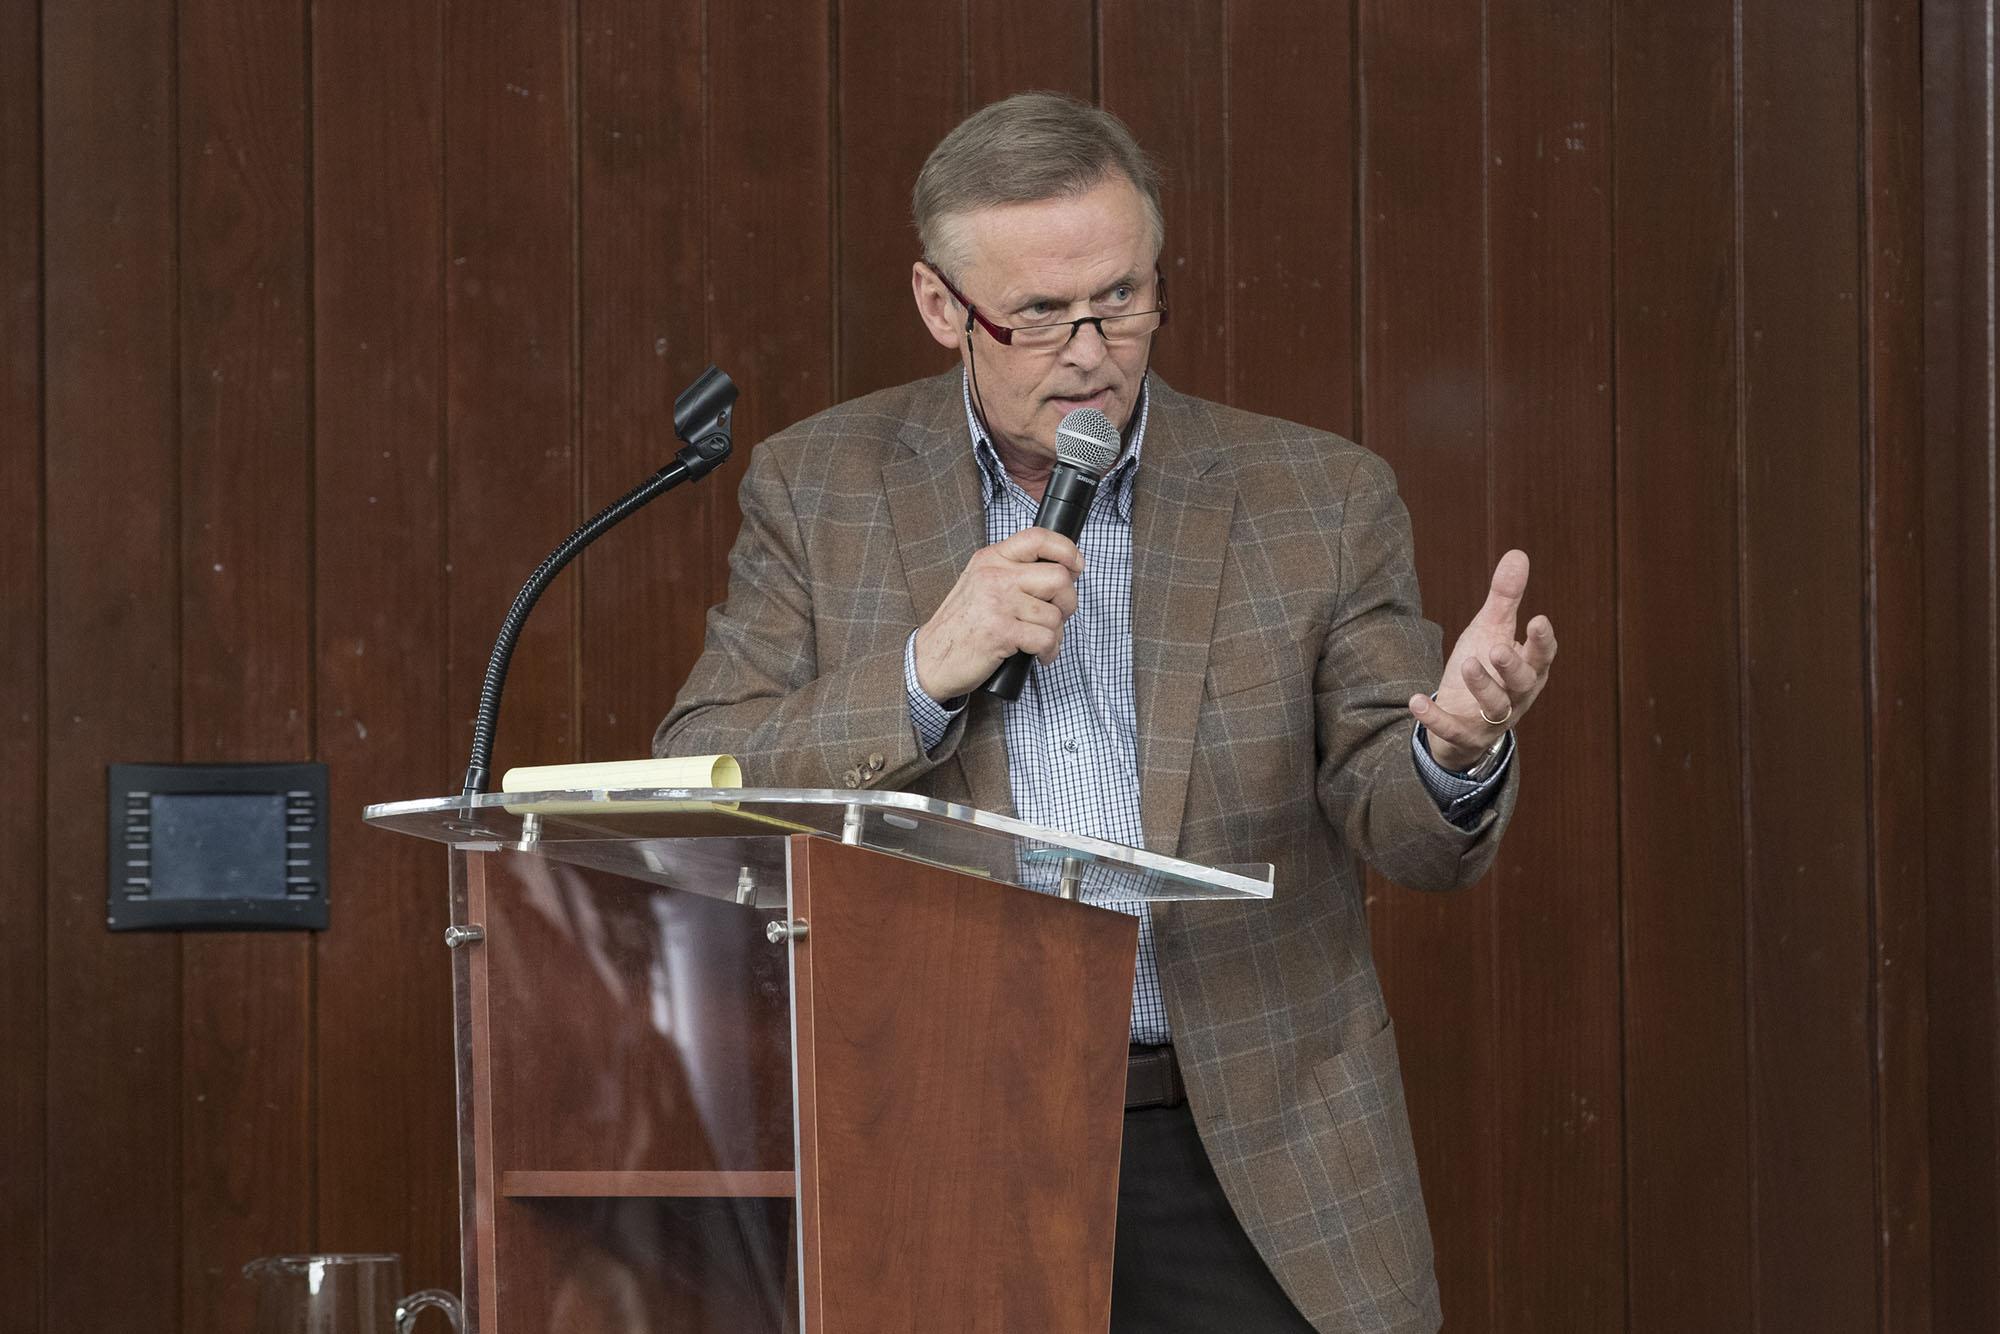 At Book Festival John Grisham Explores Issues Of